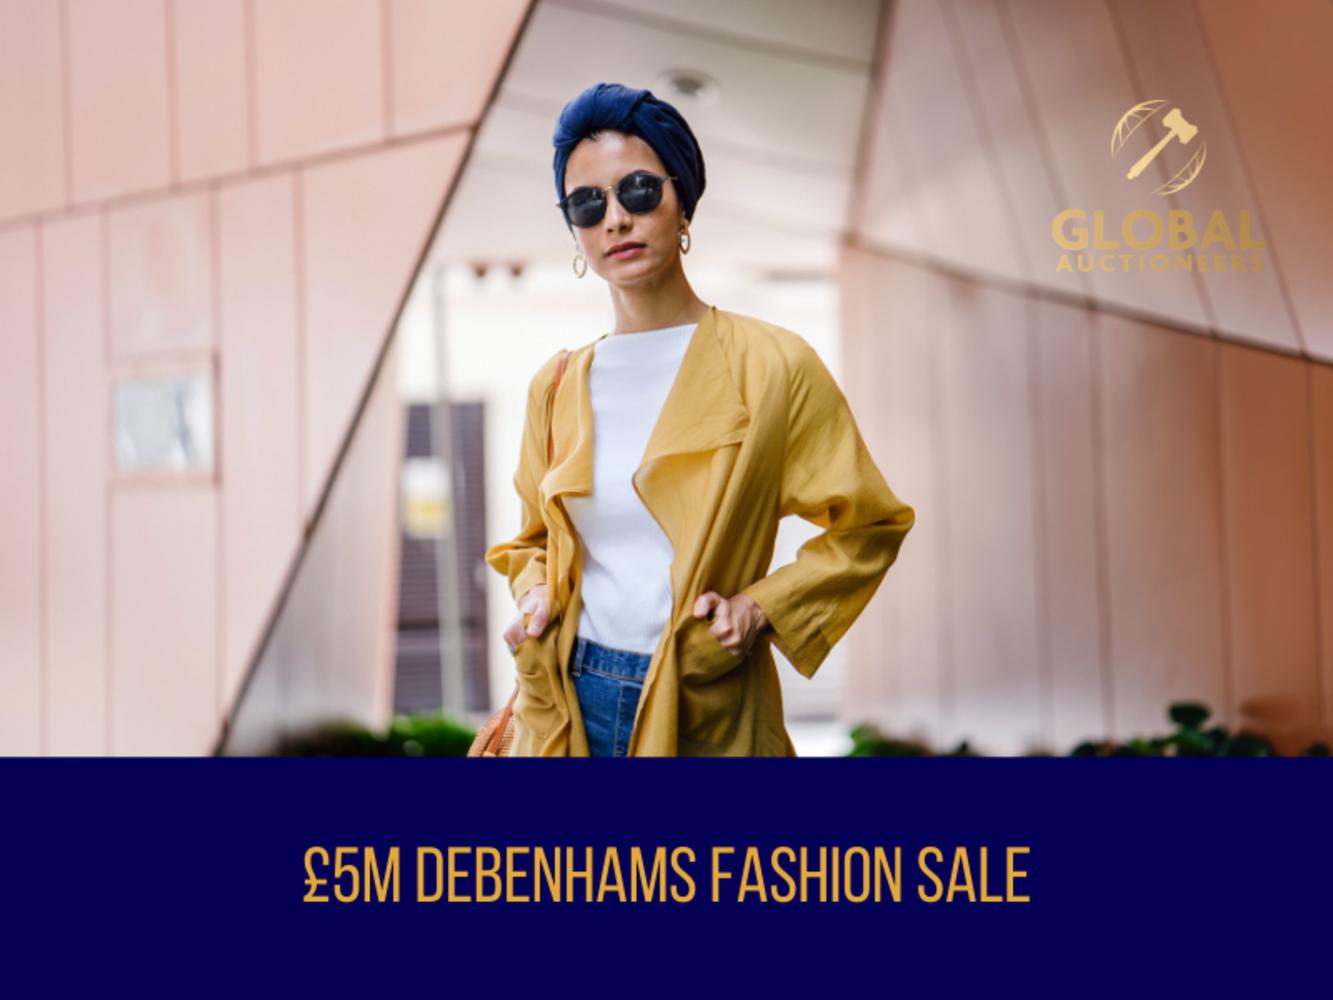 The £5m Debenhams Mega Fashion Sale - 19th March 2021